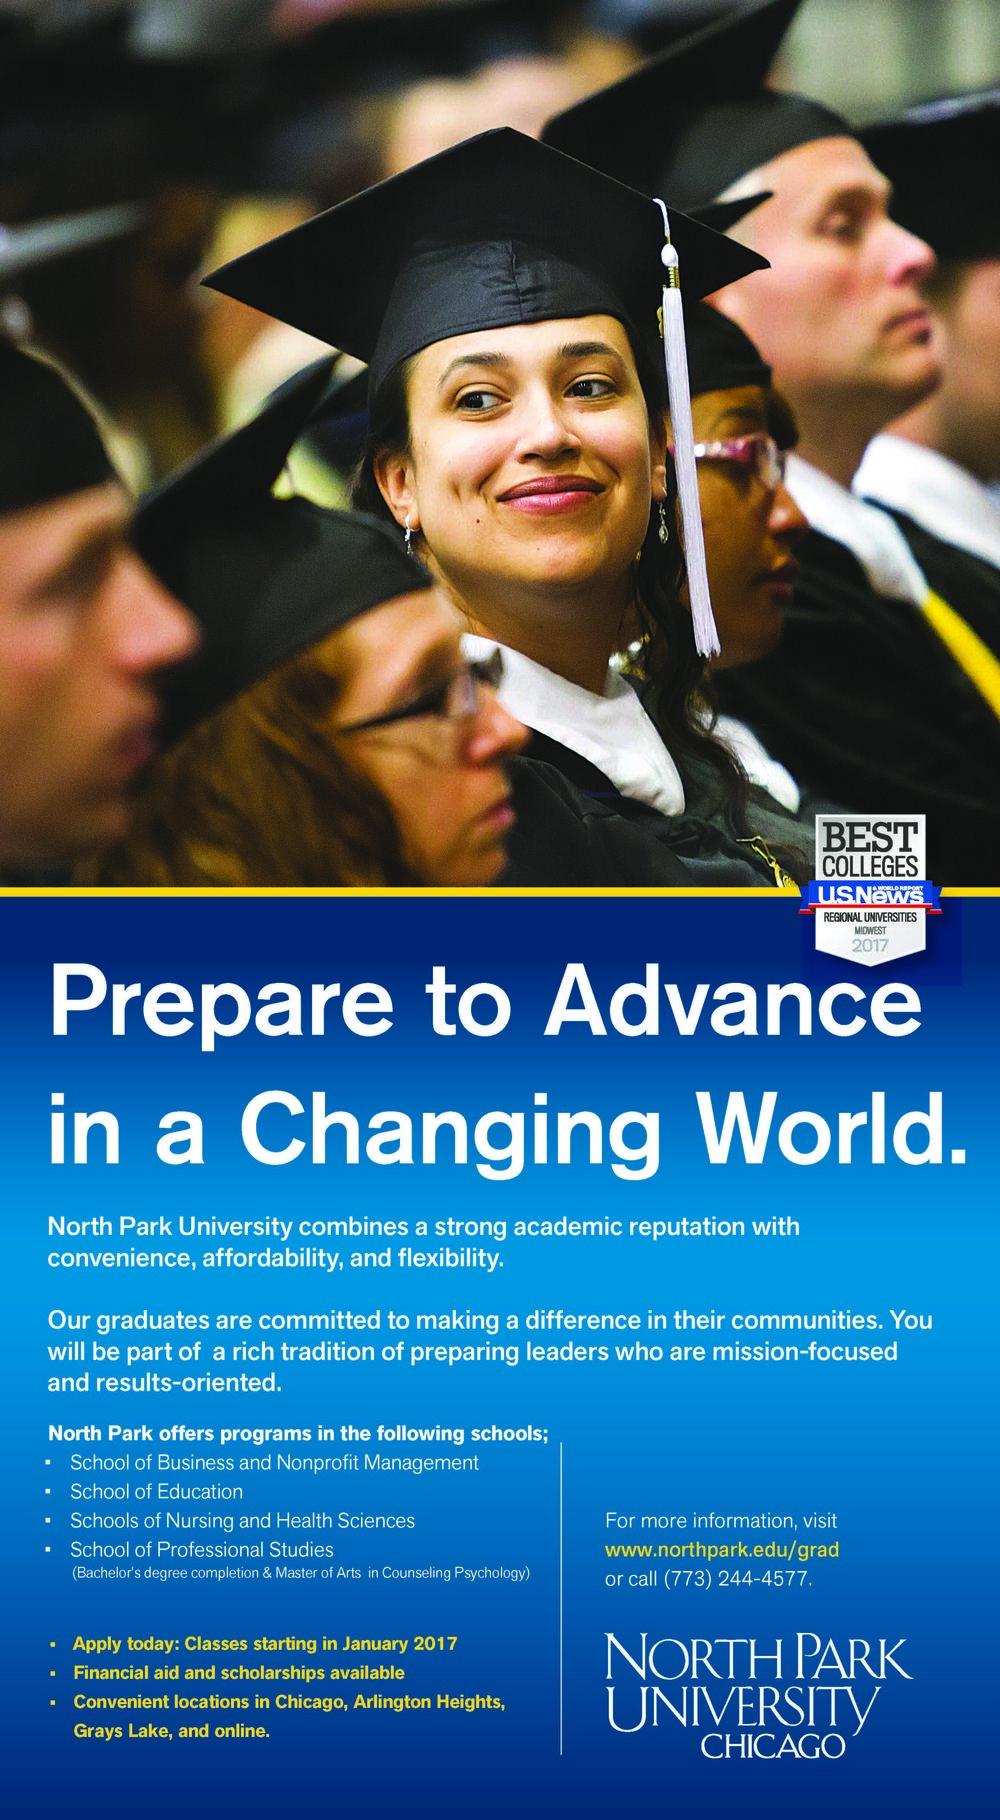 UMC-13880 Daily Herald SPS quarter Ad.jpg